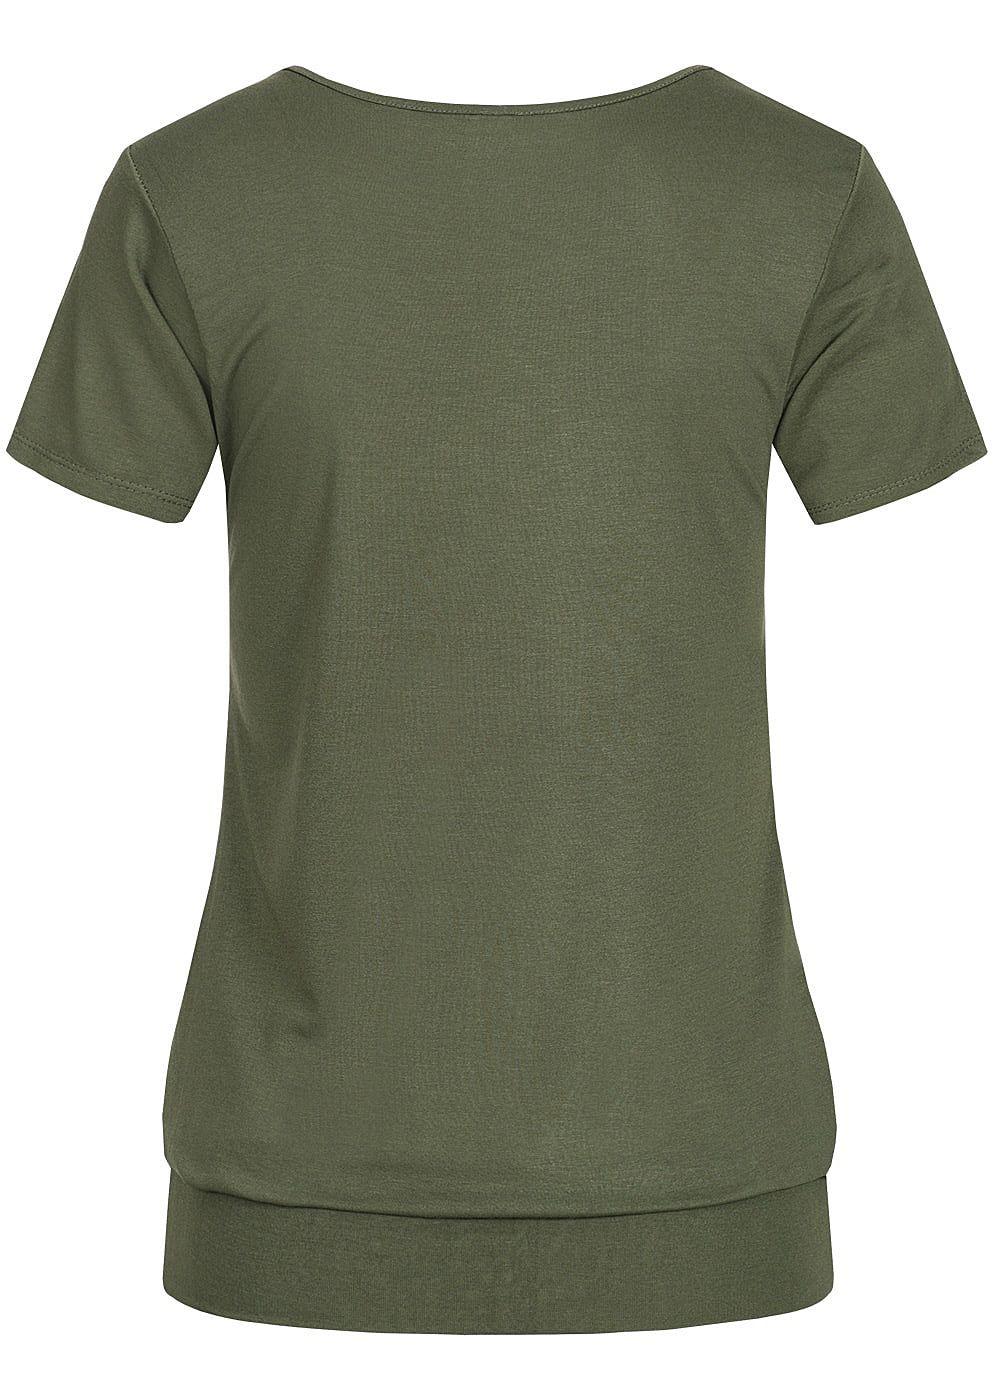 a4b4cc24f40c7f Styleboom Fashion Damen T-Shirt Deko Knöpfe military grün - 77onlineshop